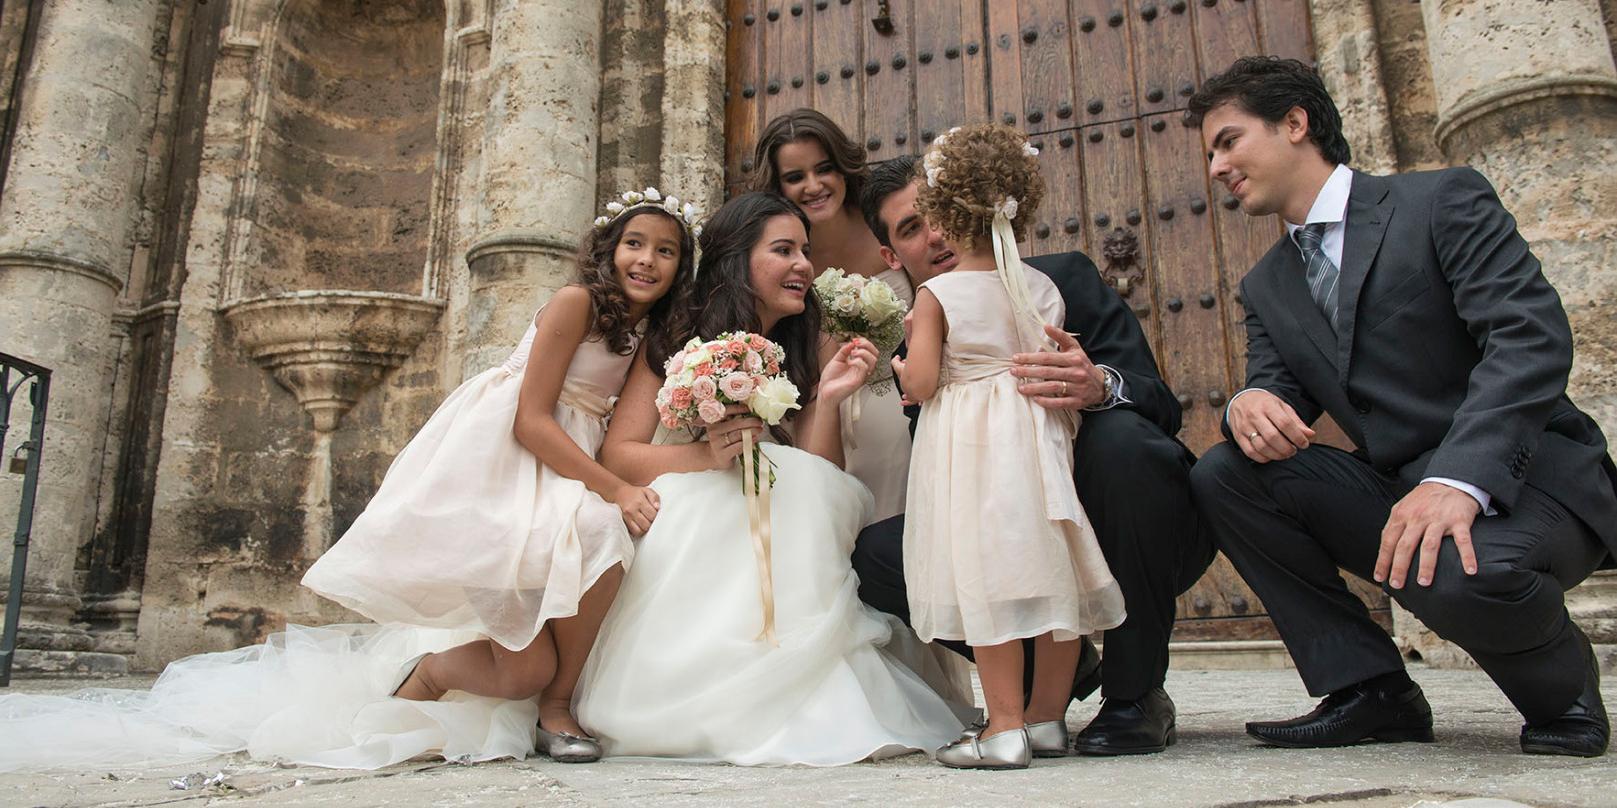 bodas-sin-clasificar-sin-tema-cuba-15601.jpg